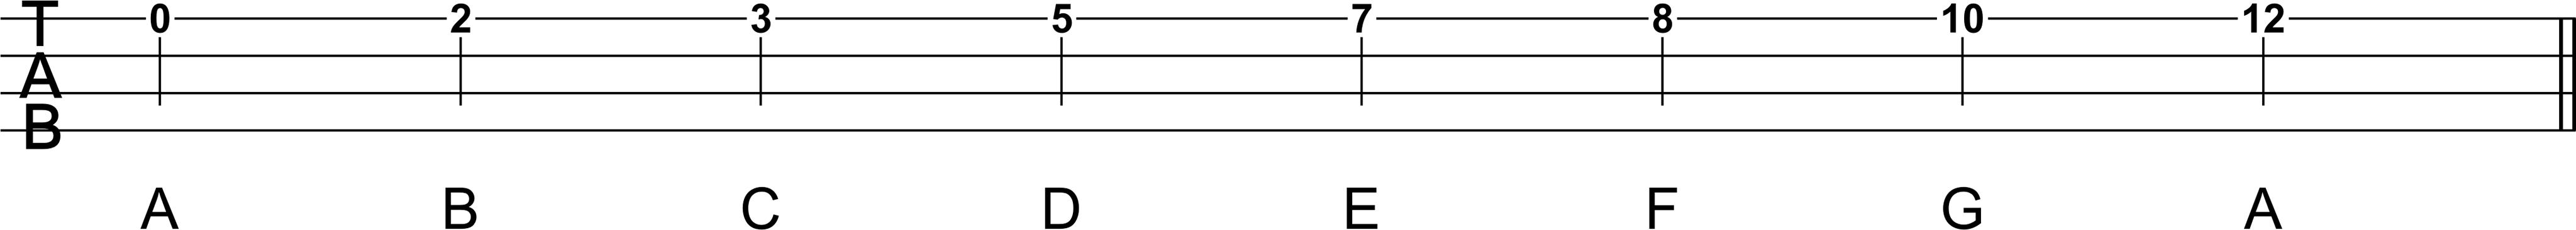 Ukulele Bottom A-String Natural Notes Scale